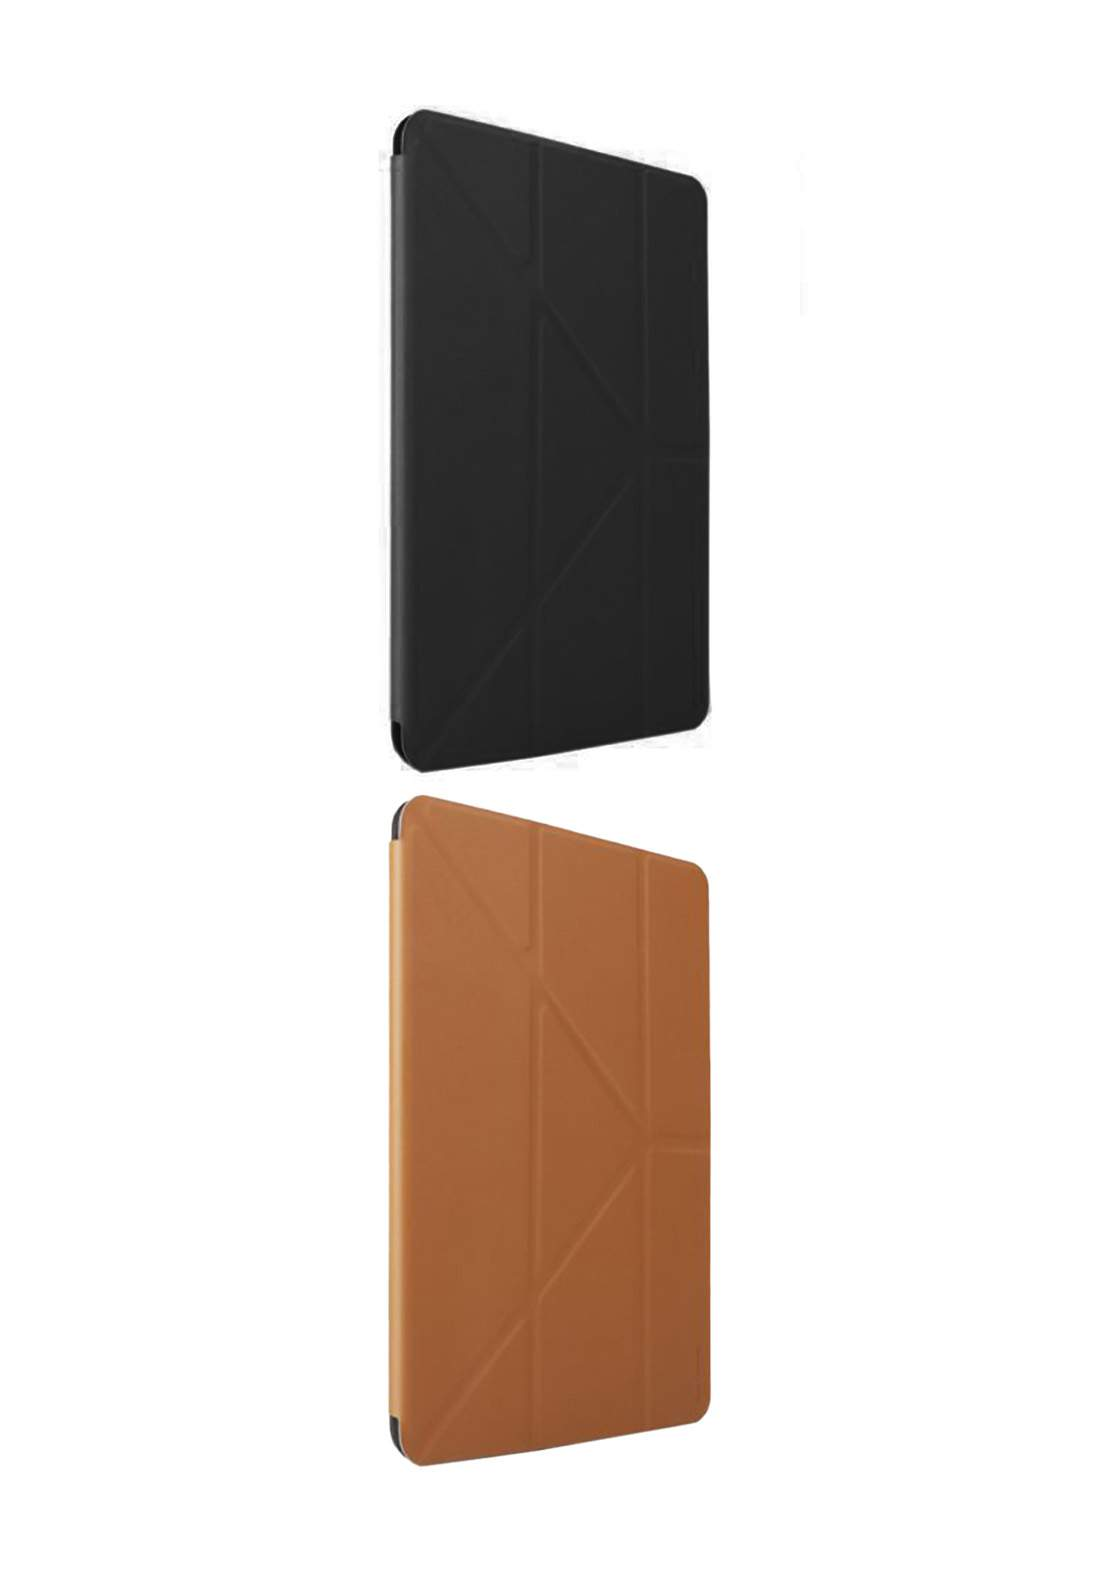 Viva Madrid Elegante Folio Case With Apple Pencil Holder for iPad 10.2 Inch حافظة ايباد